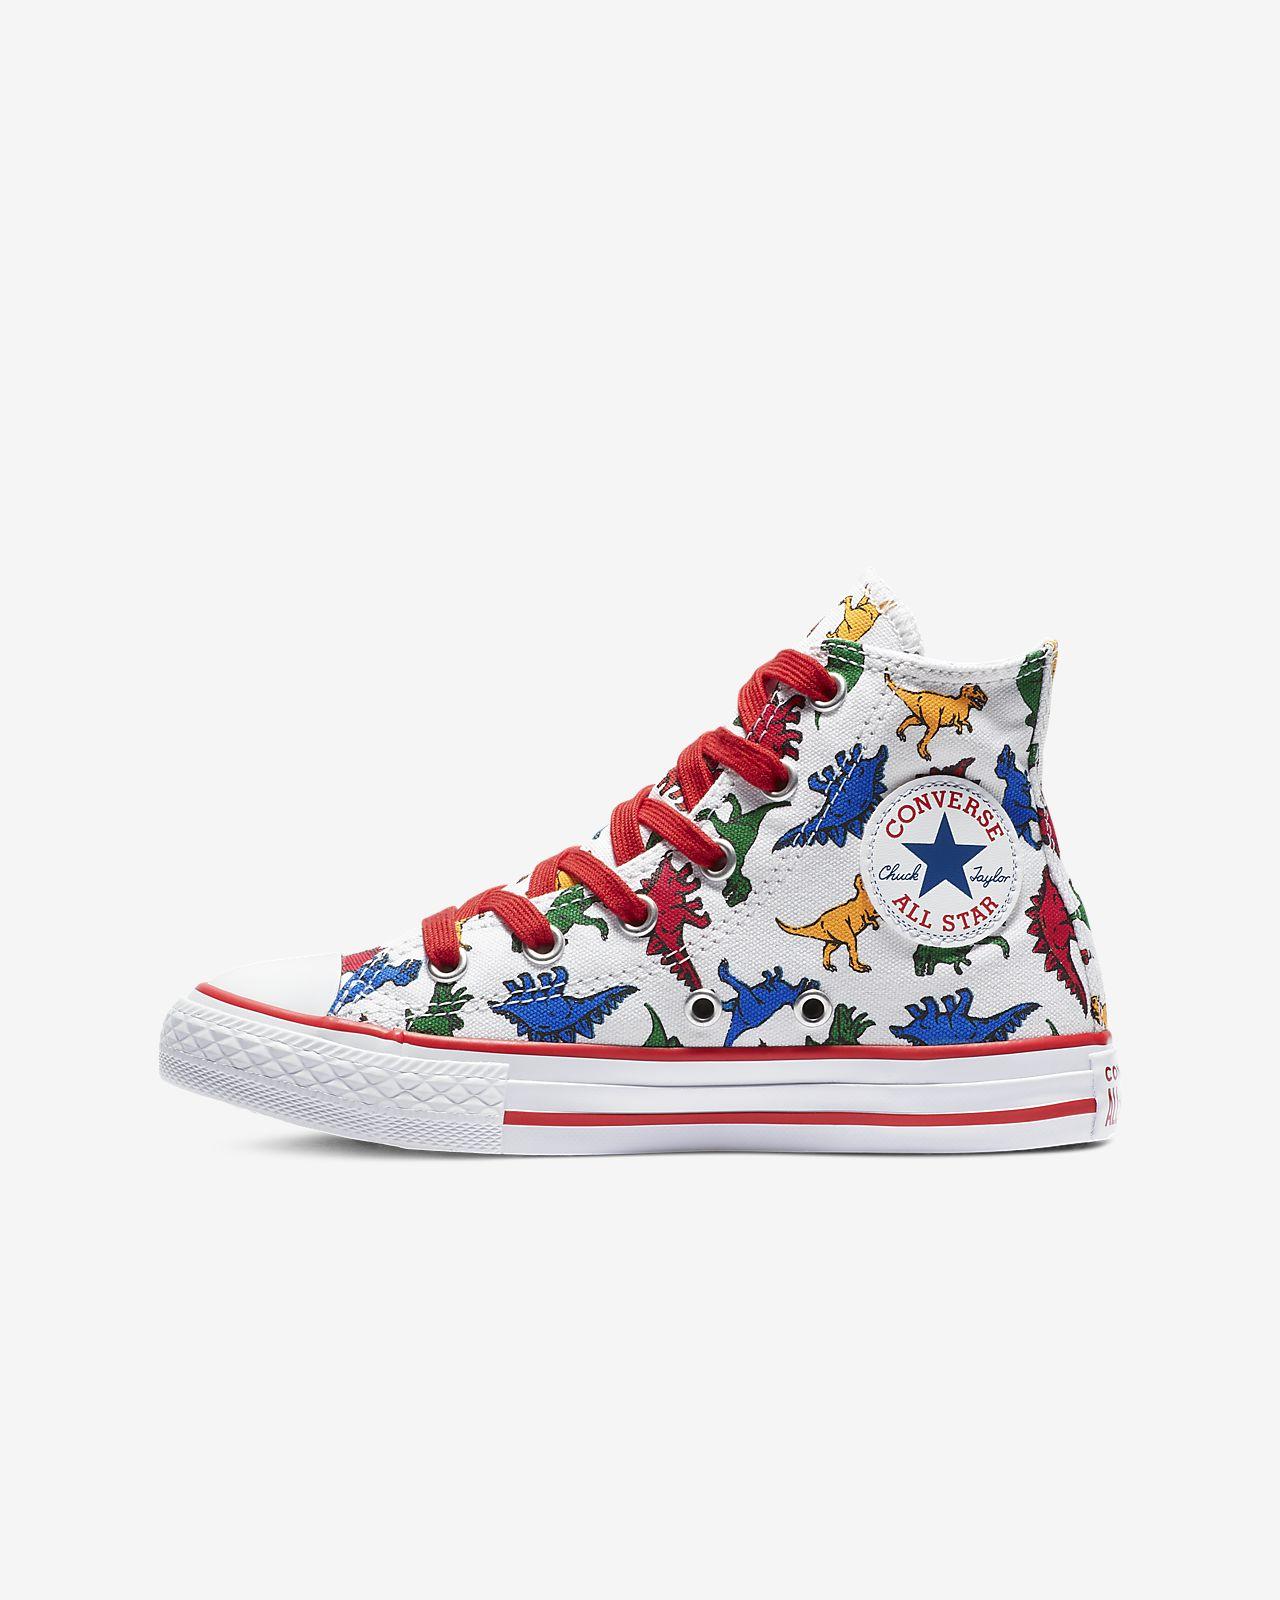 Converse Chuck Taylor All Star Dinoverse High Top Big Kids' Shoe